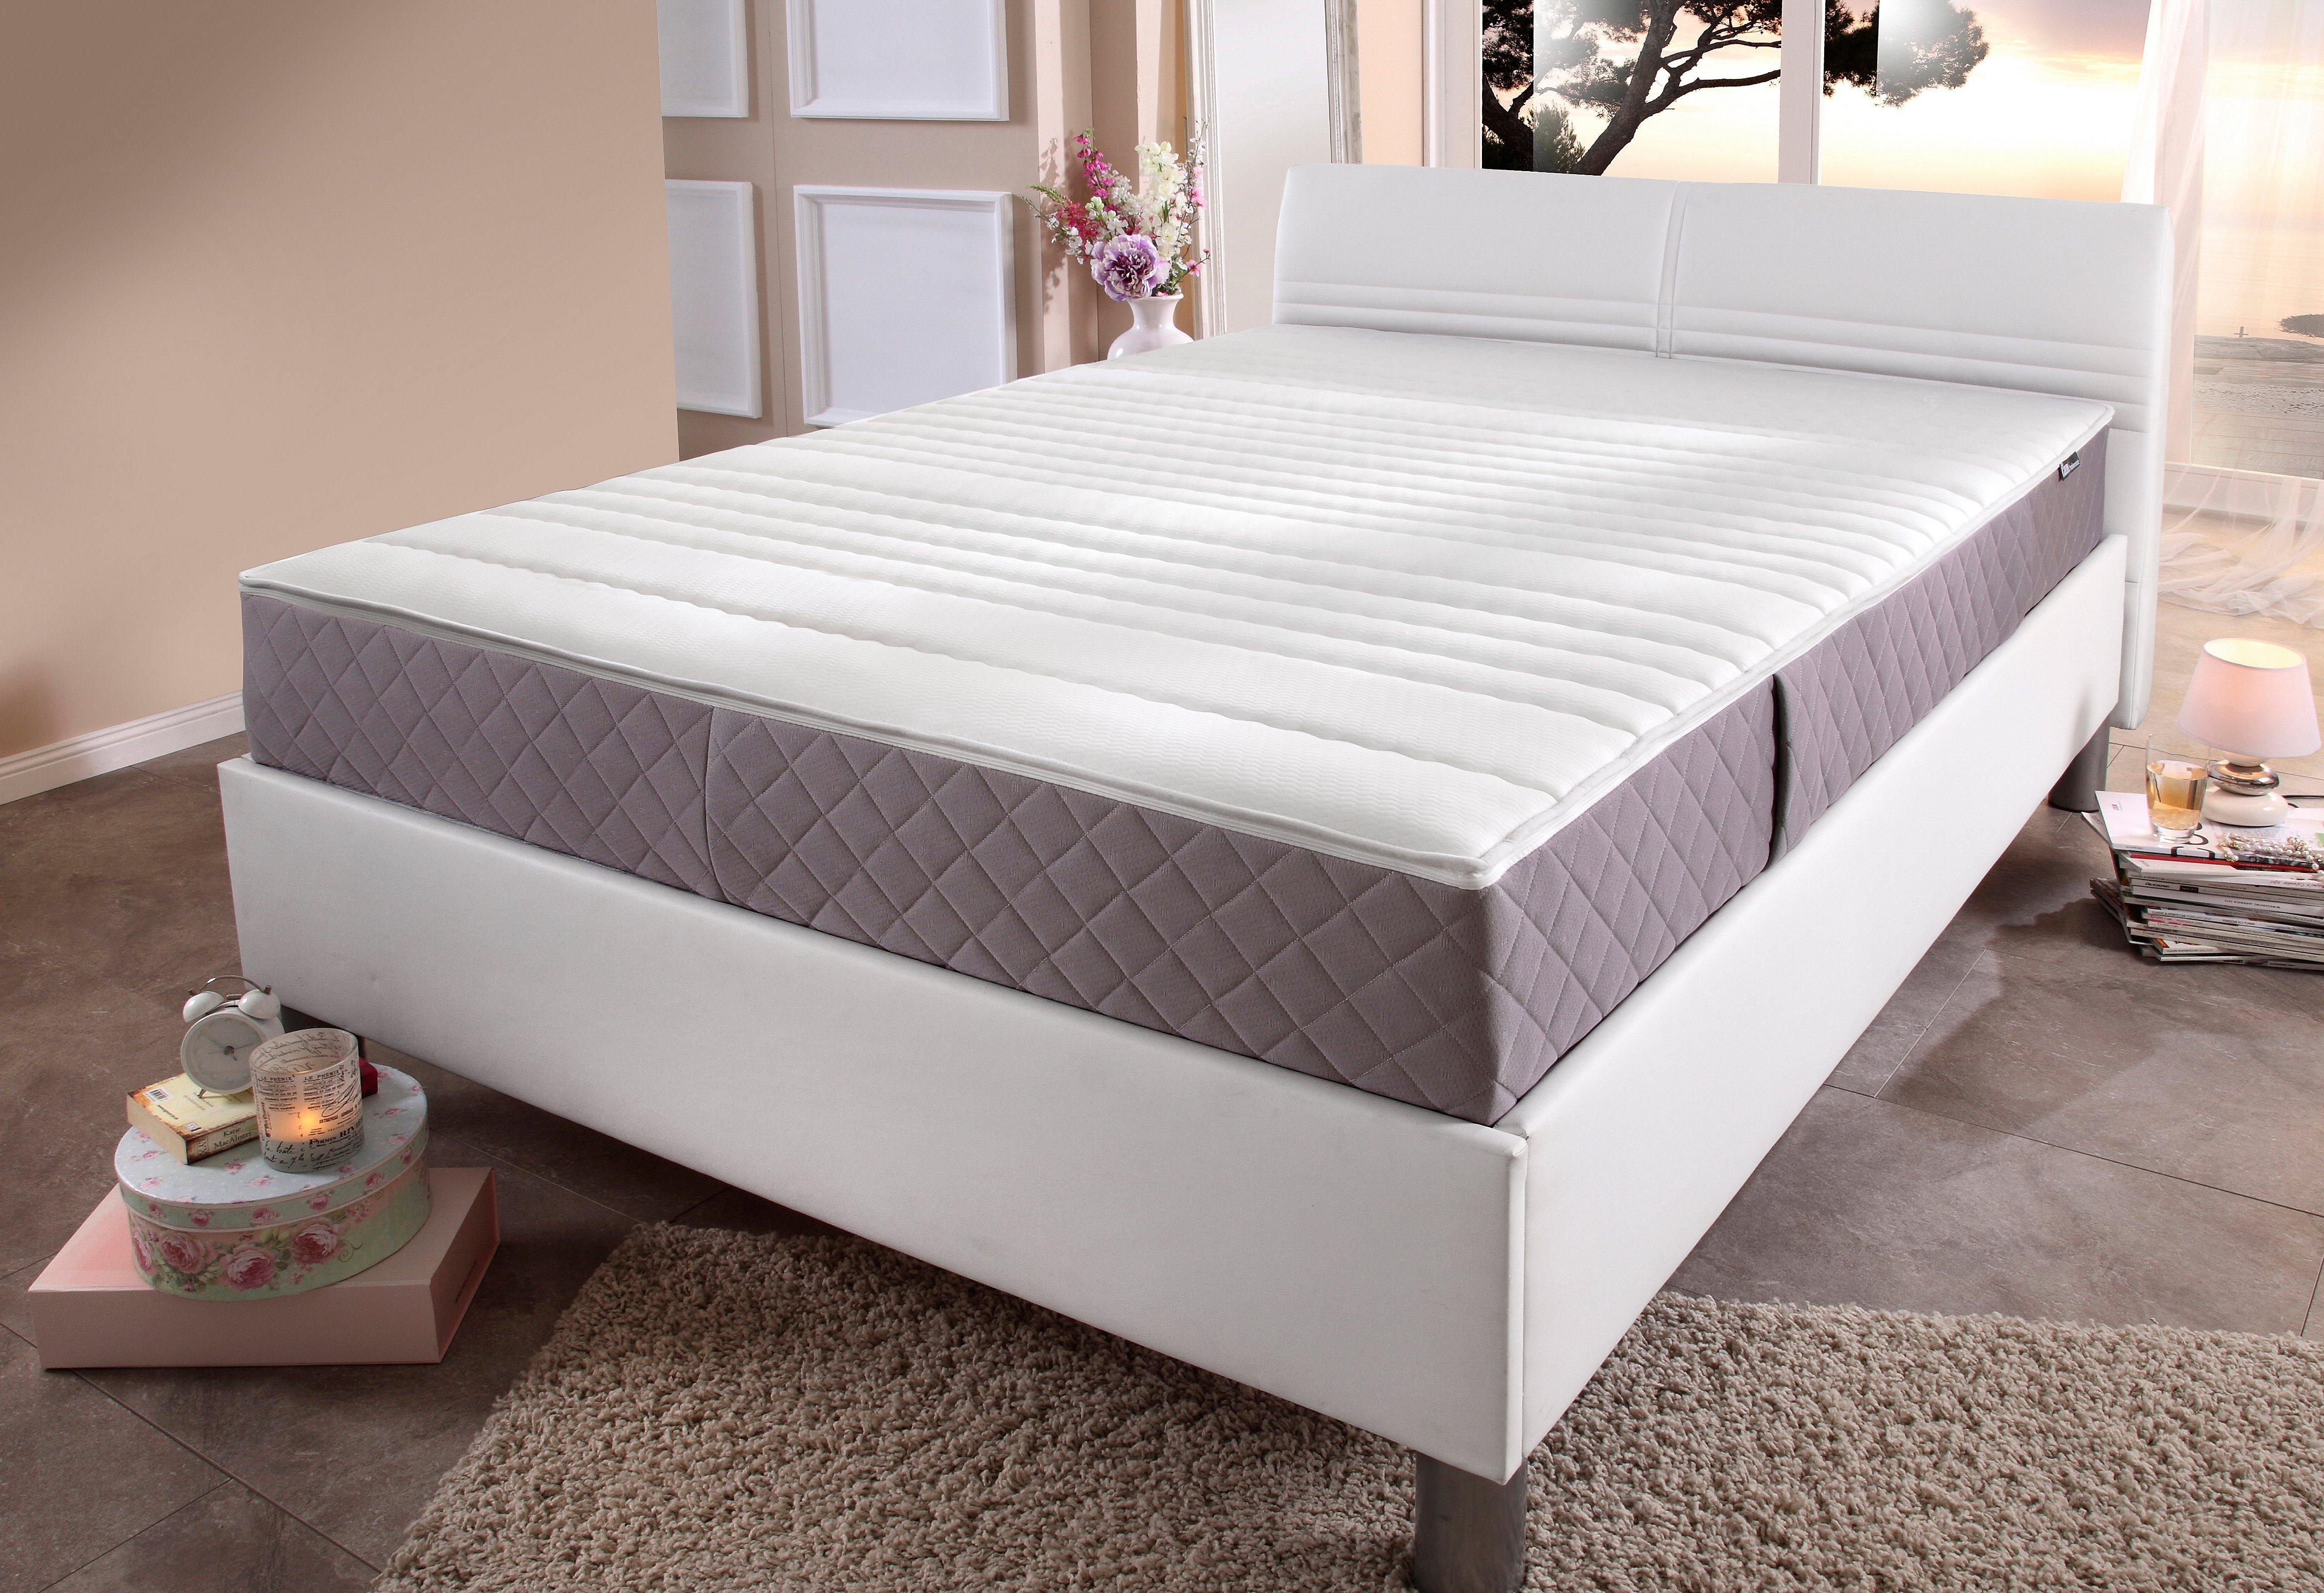 tonnentaschenfederkern matratze 500t f a n. Black Bedroom Furniture Sets. Home Design Ideas